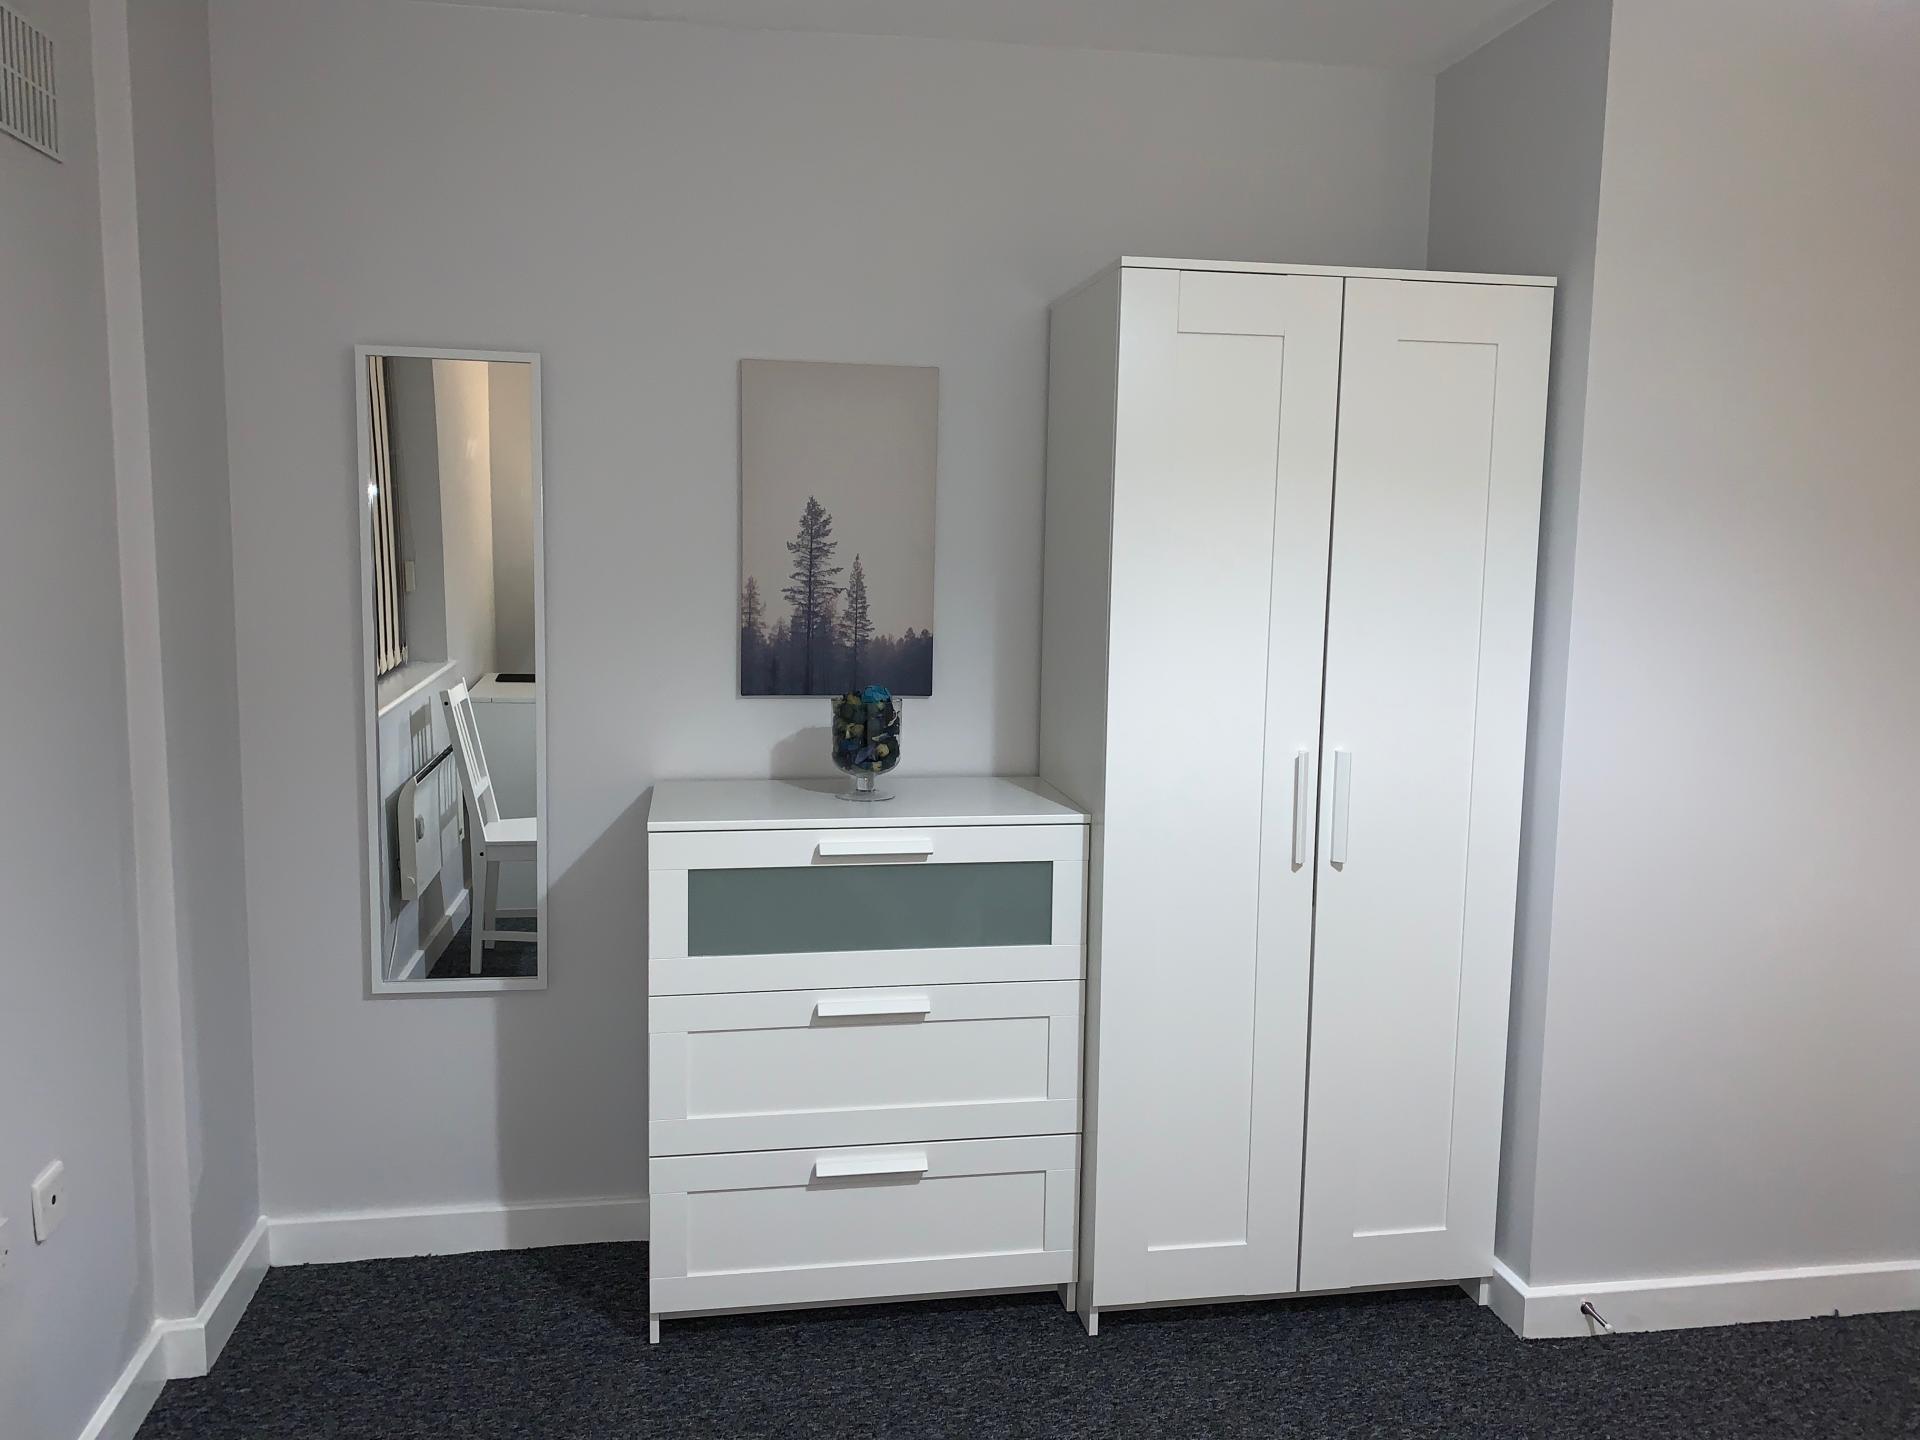 Wardrobe at Kelham Island Apartment, Neepsend, Sheffield